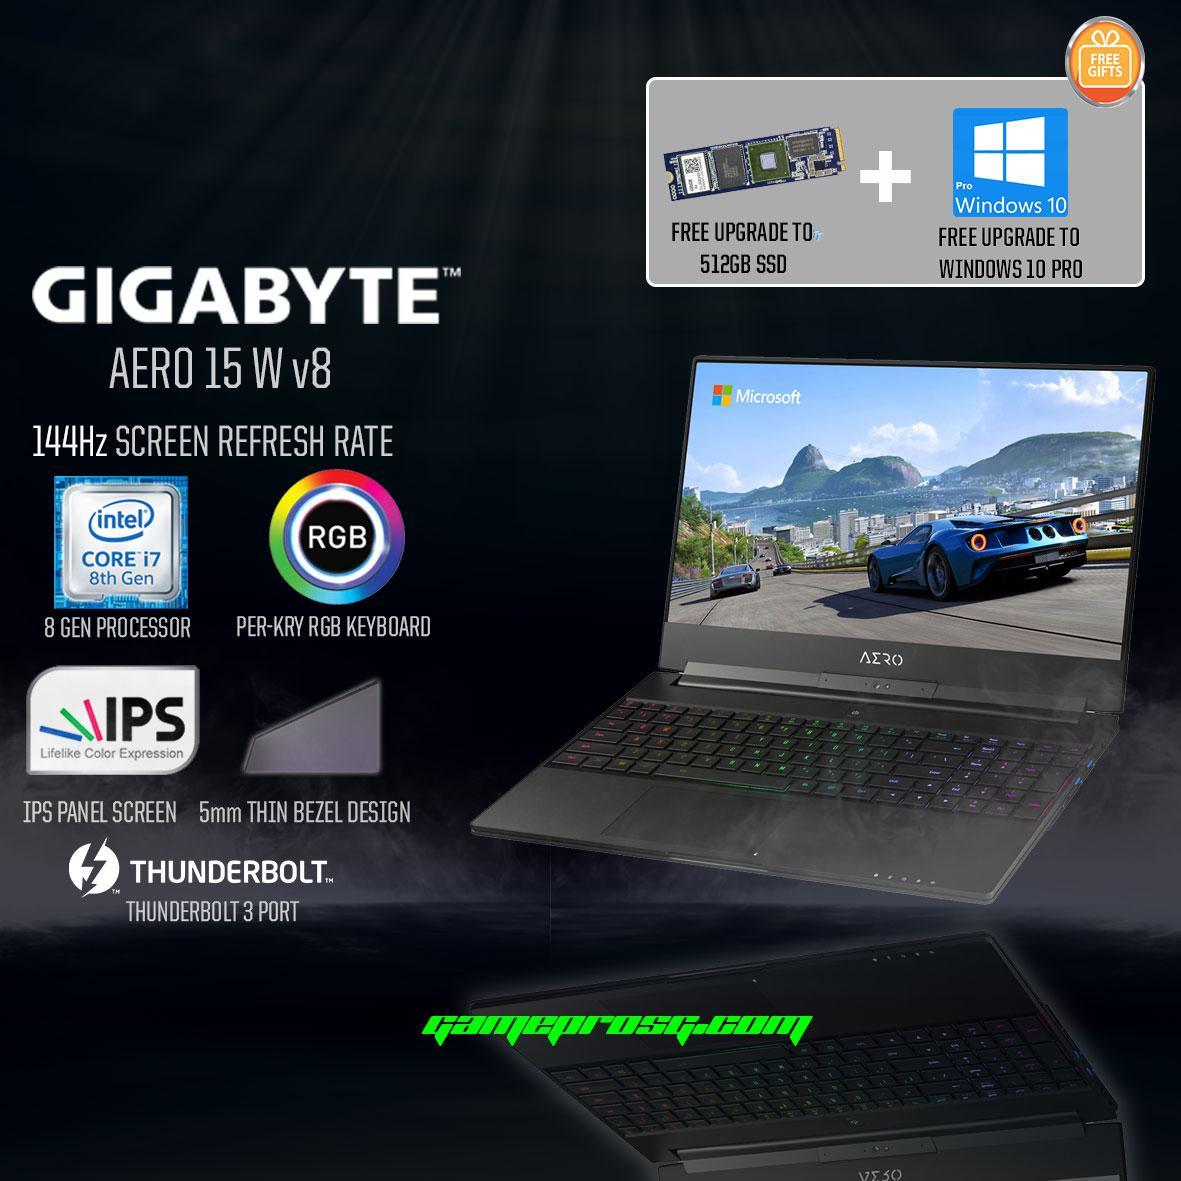 8th Gen GIGABYTE AERO 15W v8 (8th-Gen GTX 1060 6GB GDDR5) 144Hz Gaming Laptop